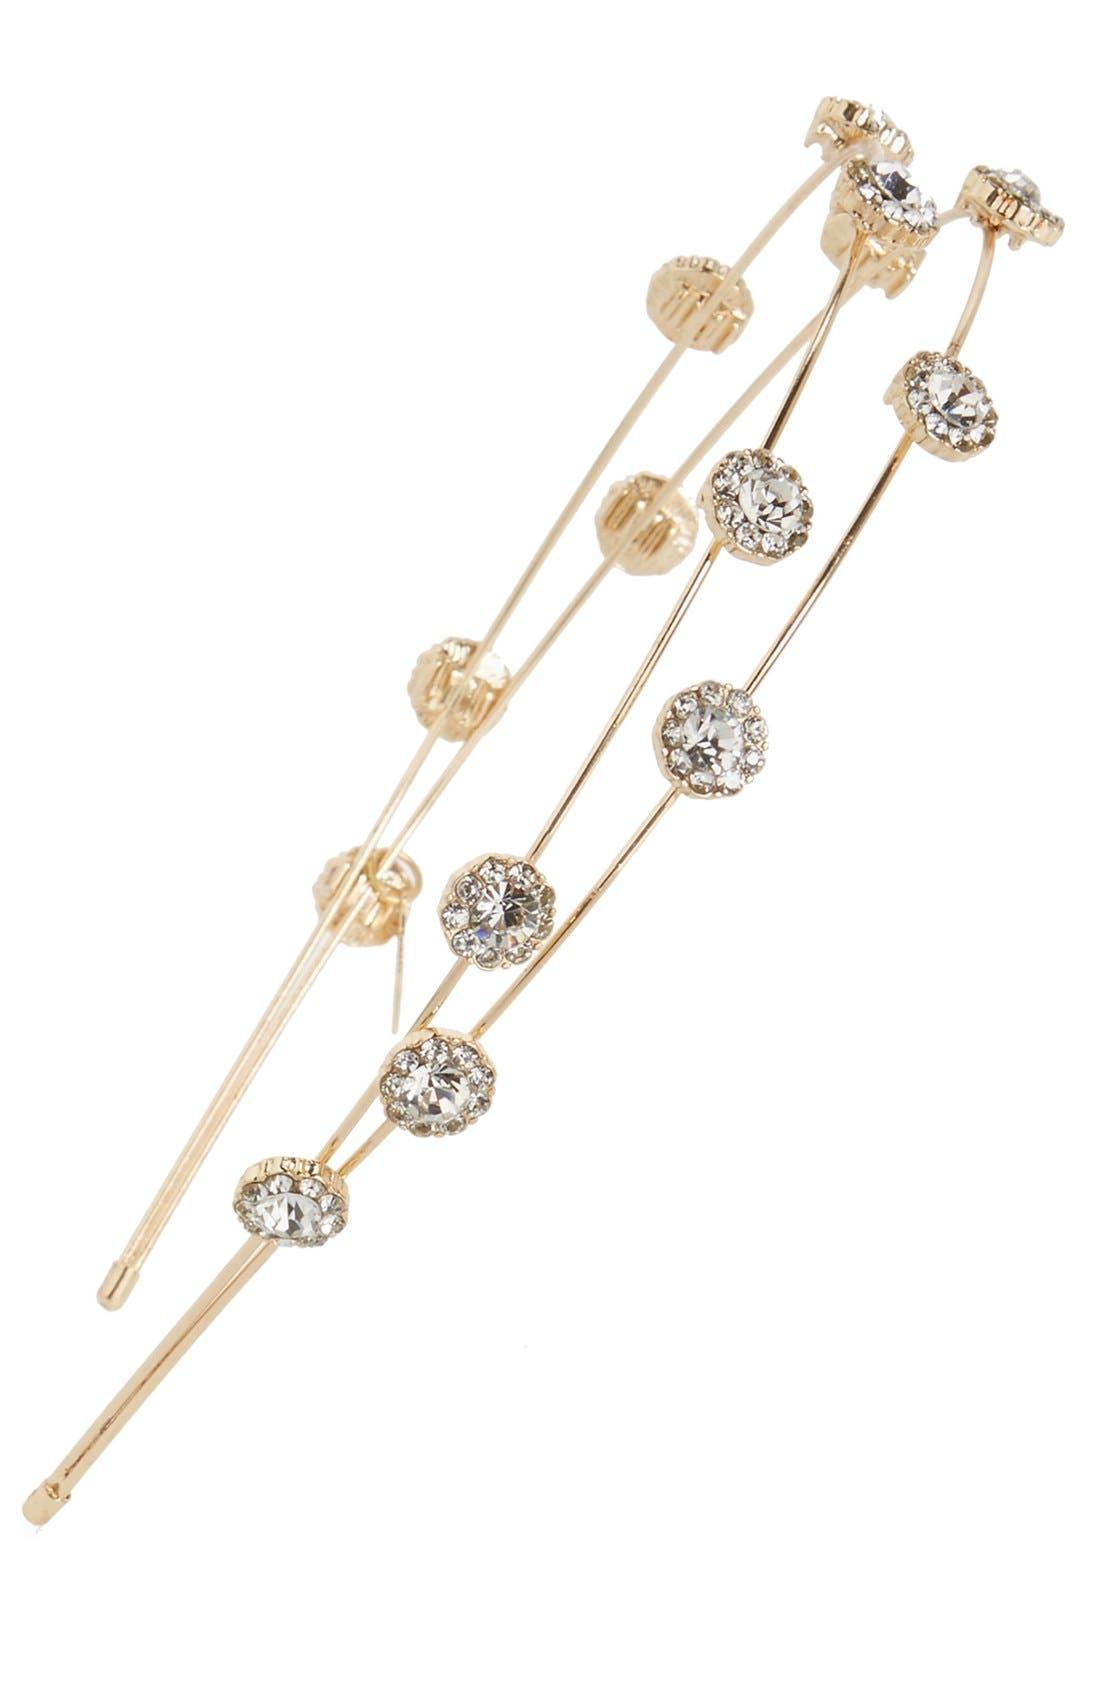 Main Image - Tasha 'Double Trouble' Floral Crystal Headband